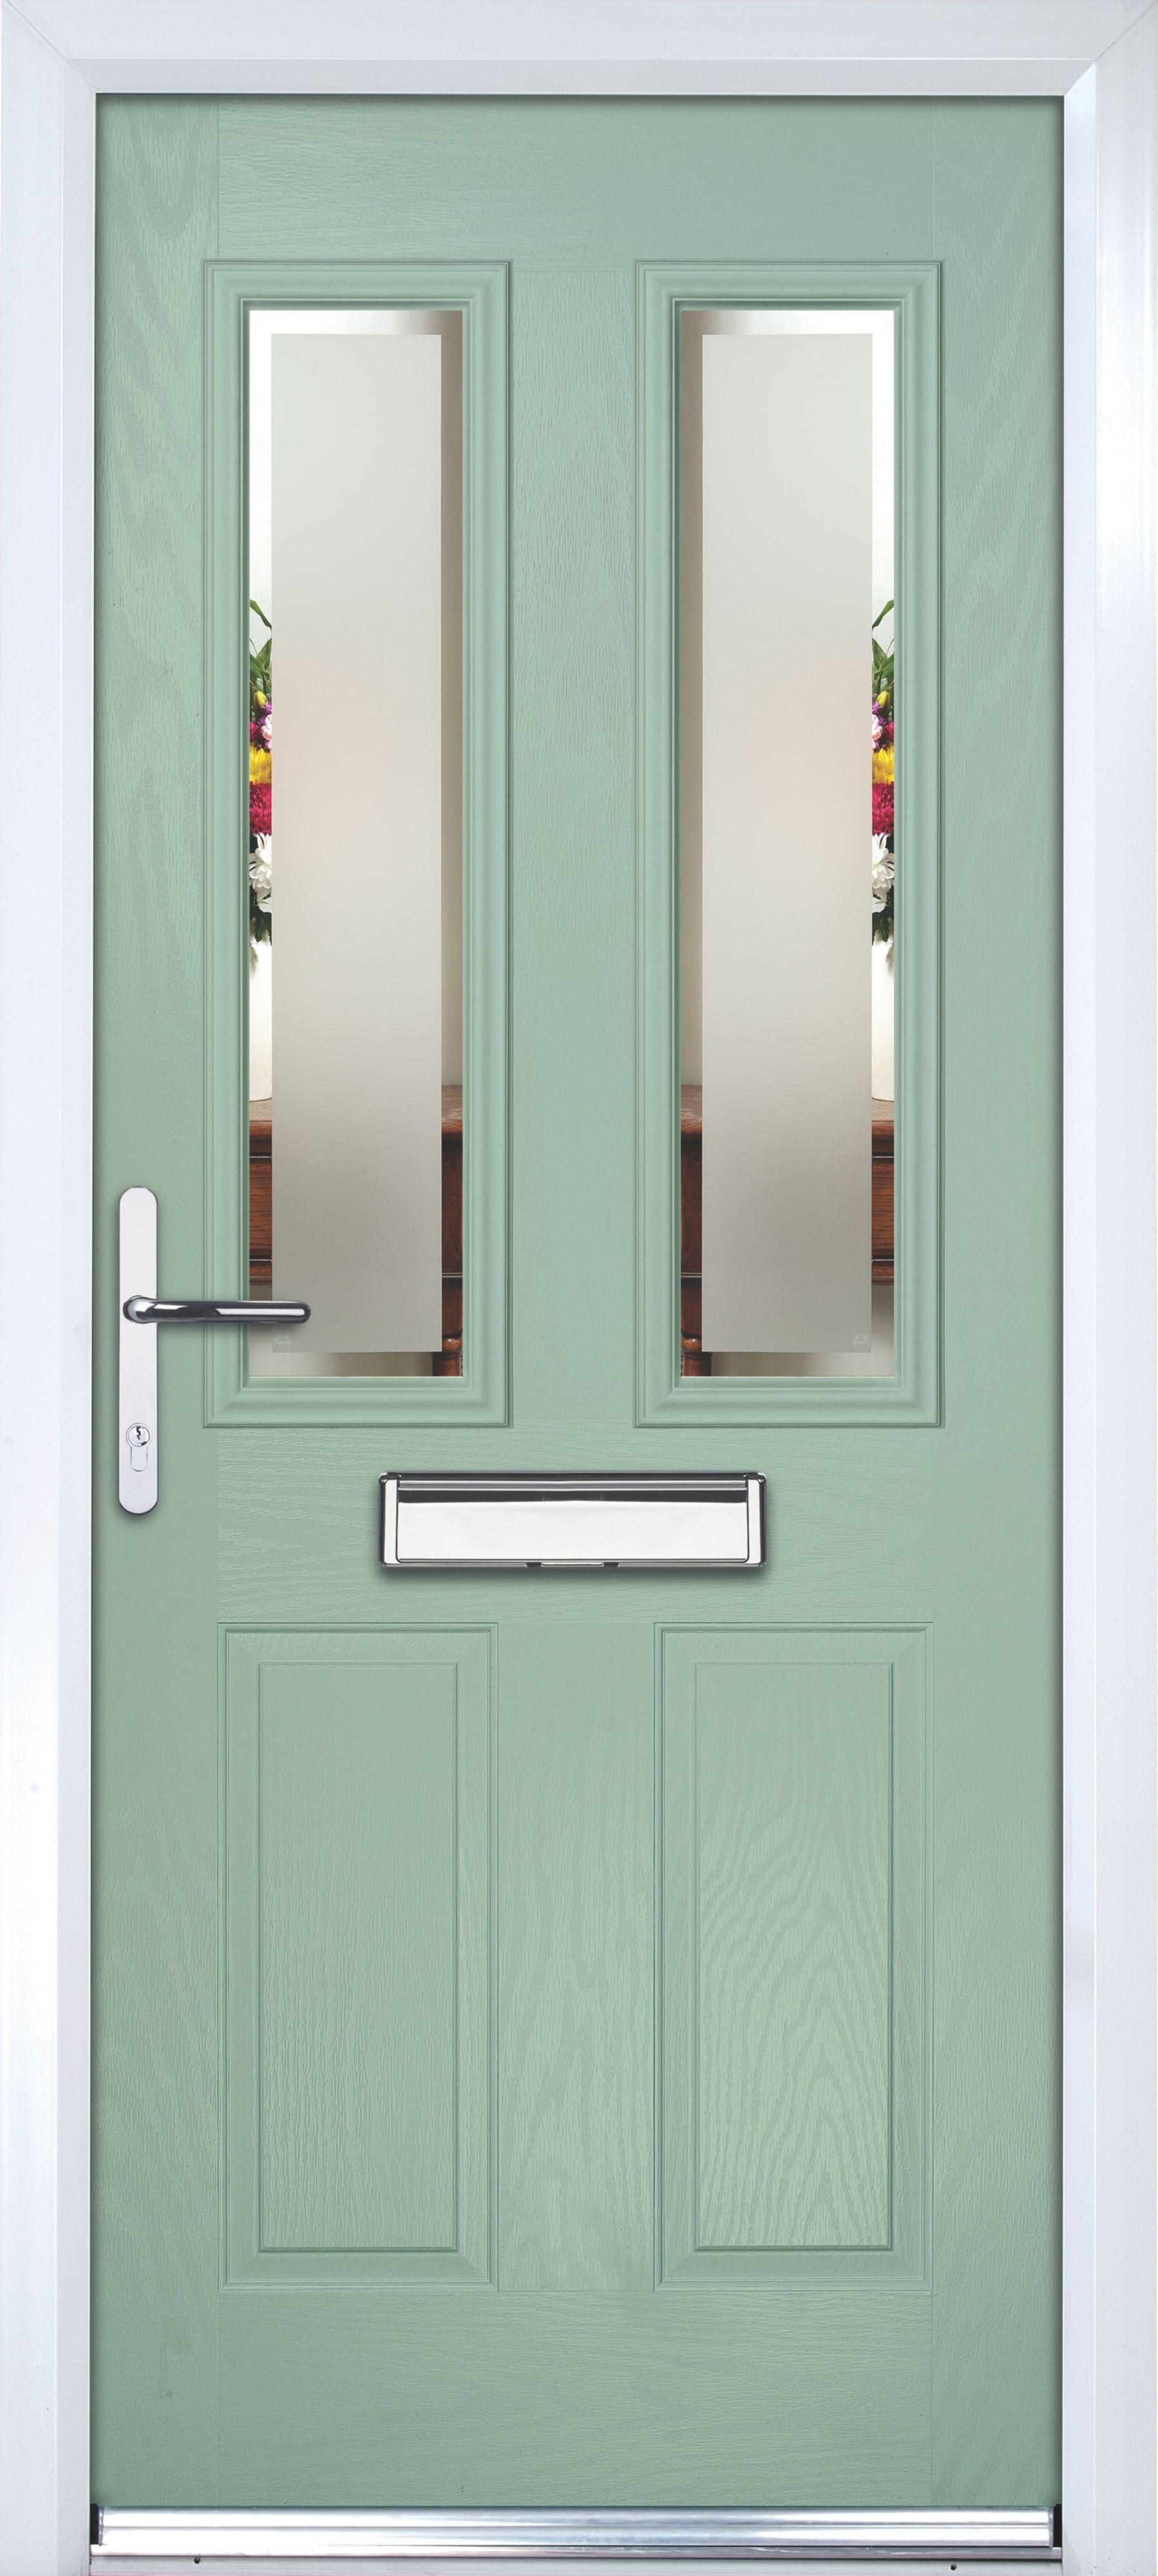 Lovely Composite Green PVCu U0026 GRP Glazed External Front Door U0026 Frame Rh, (H)